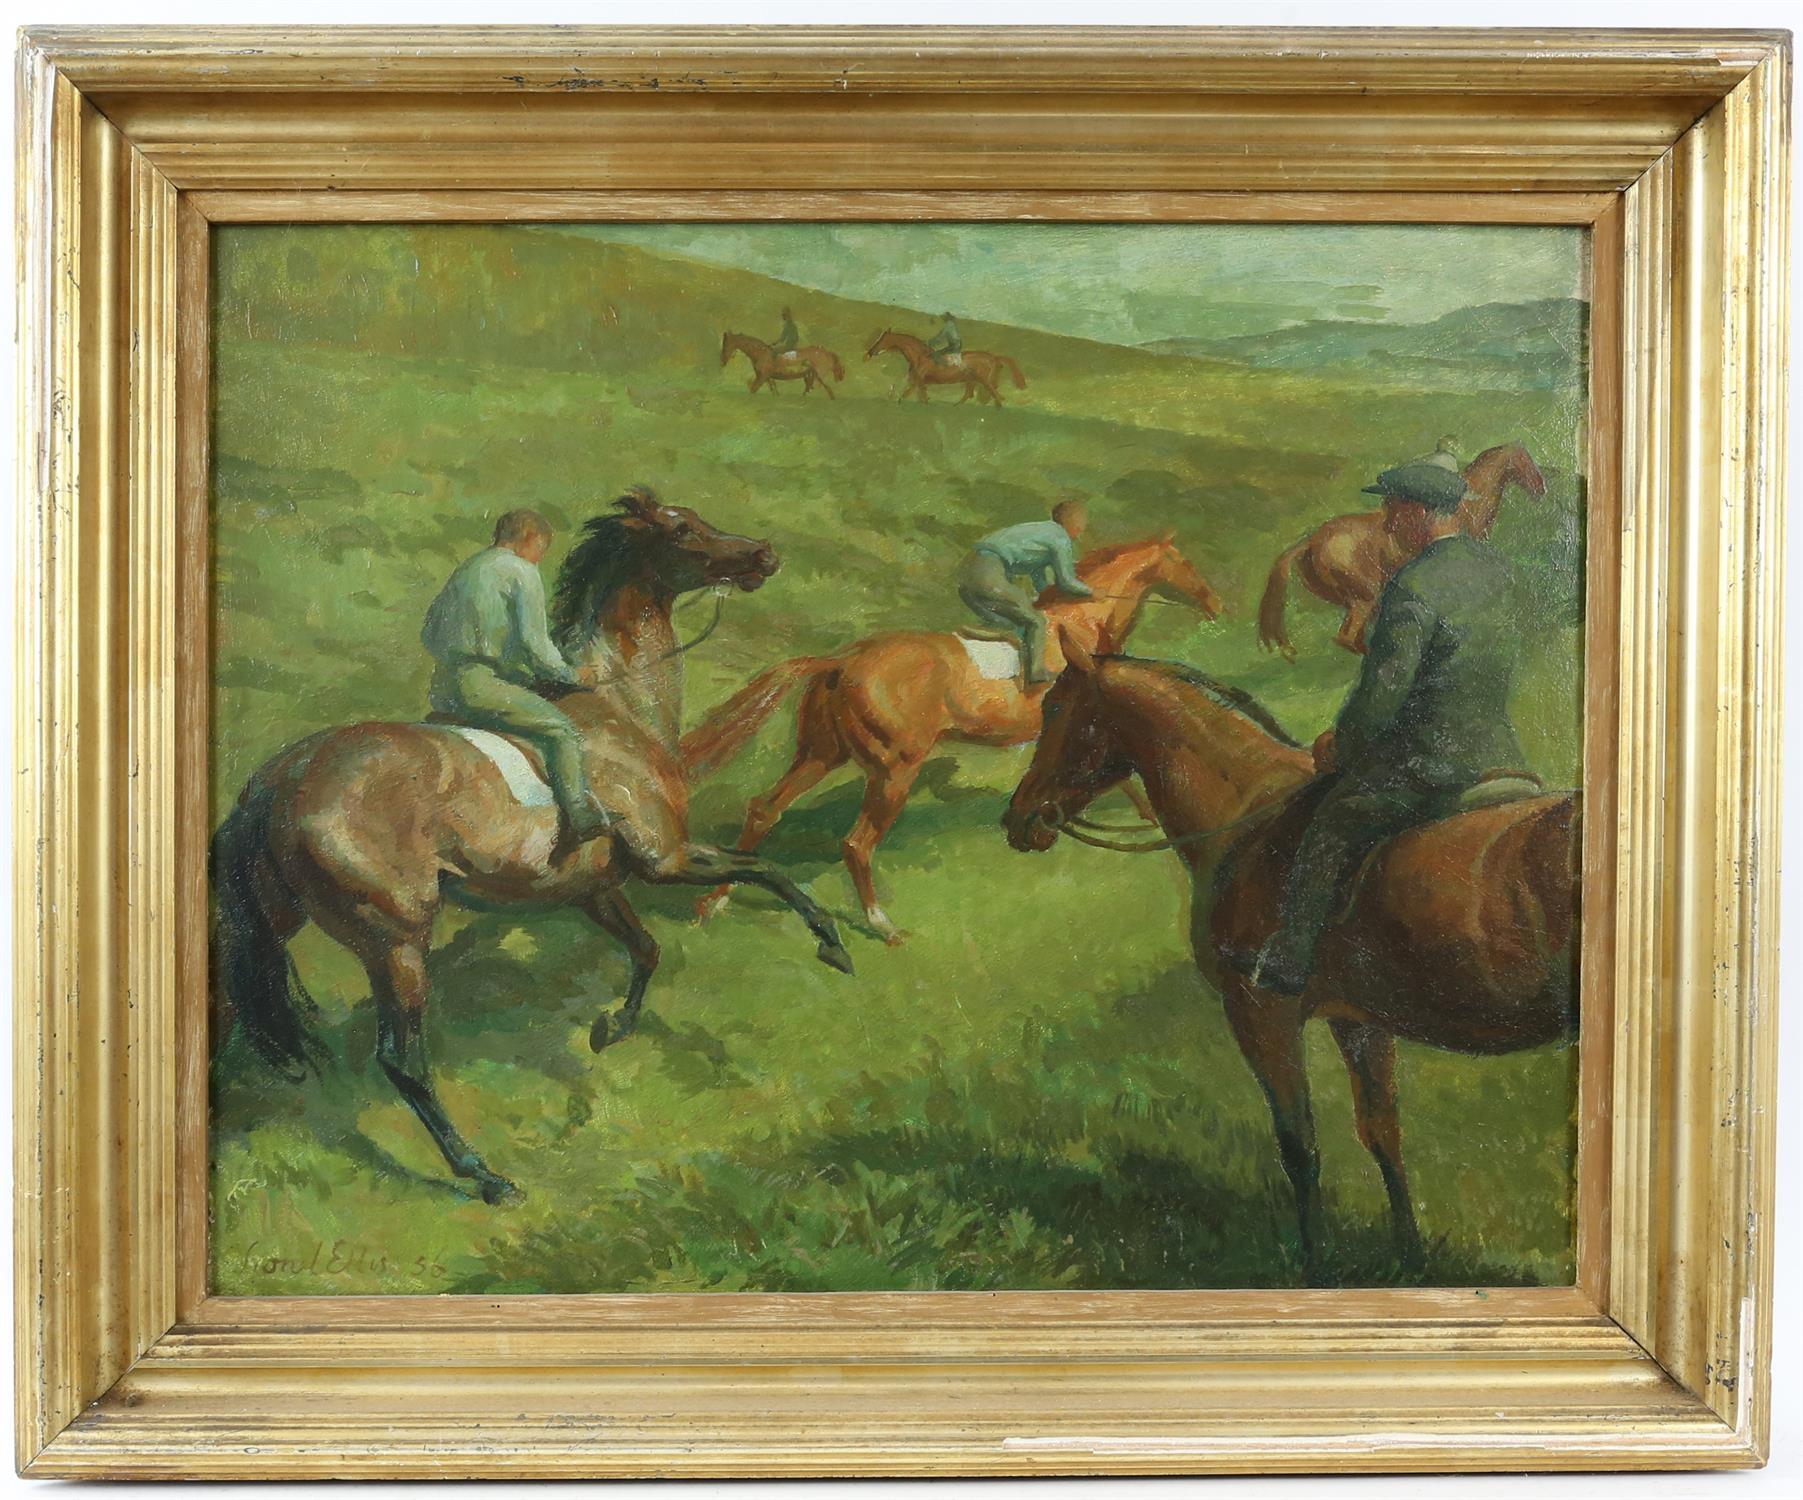 § Lionel Ellis (1903-1988) Horsemen on a hillside. Oil in board 1956, signed and dated lower left. - Image 2 of 4